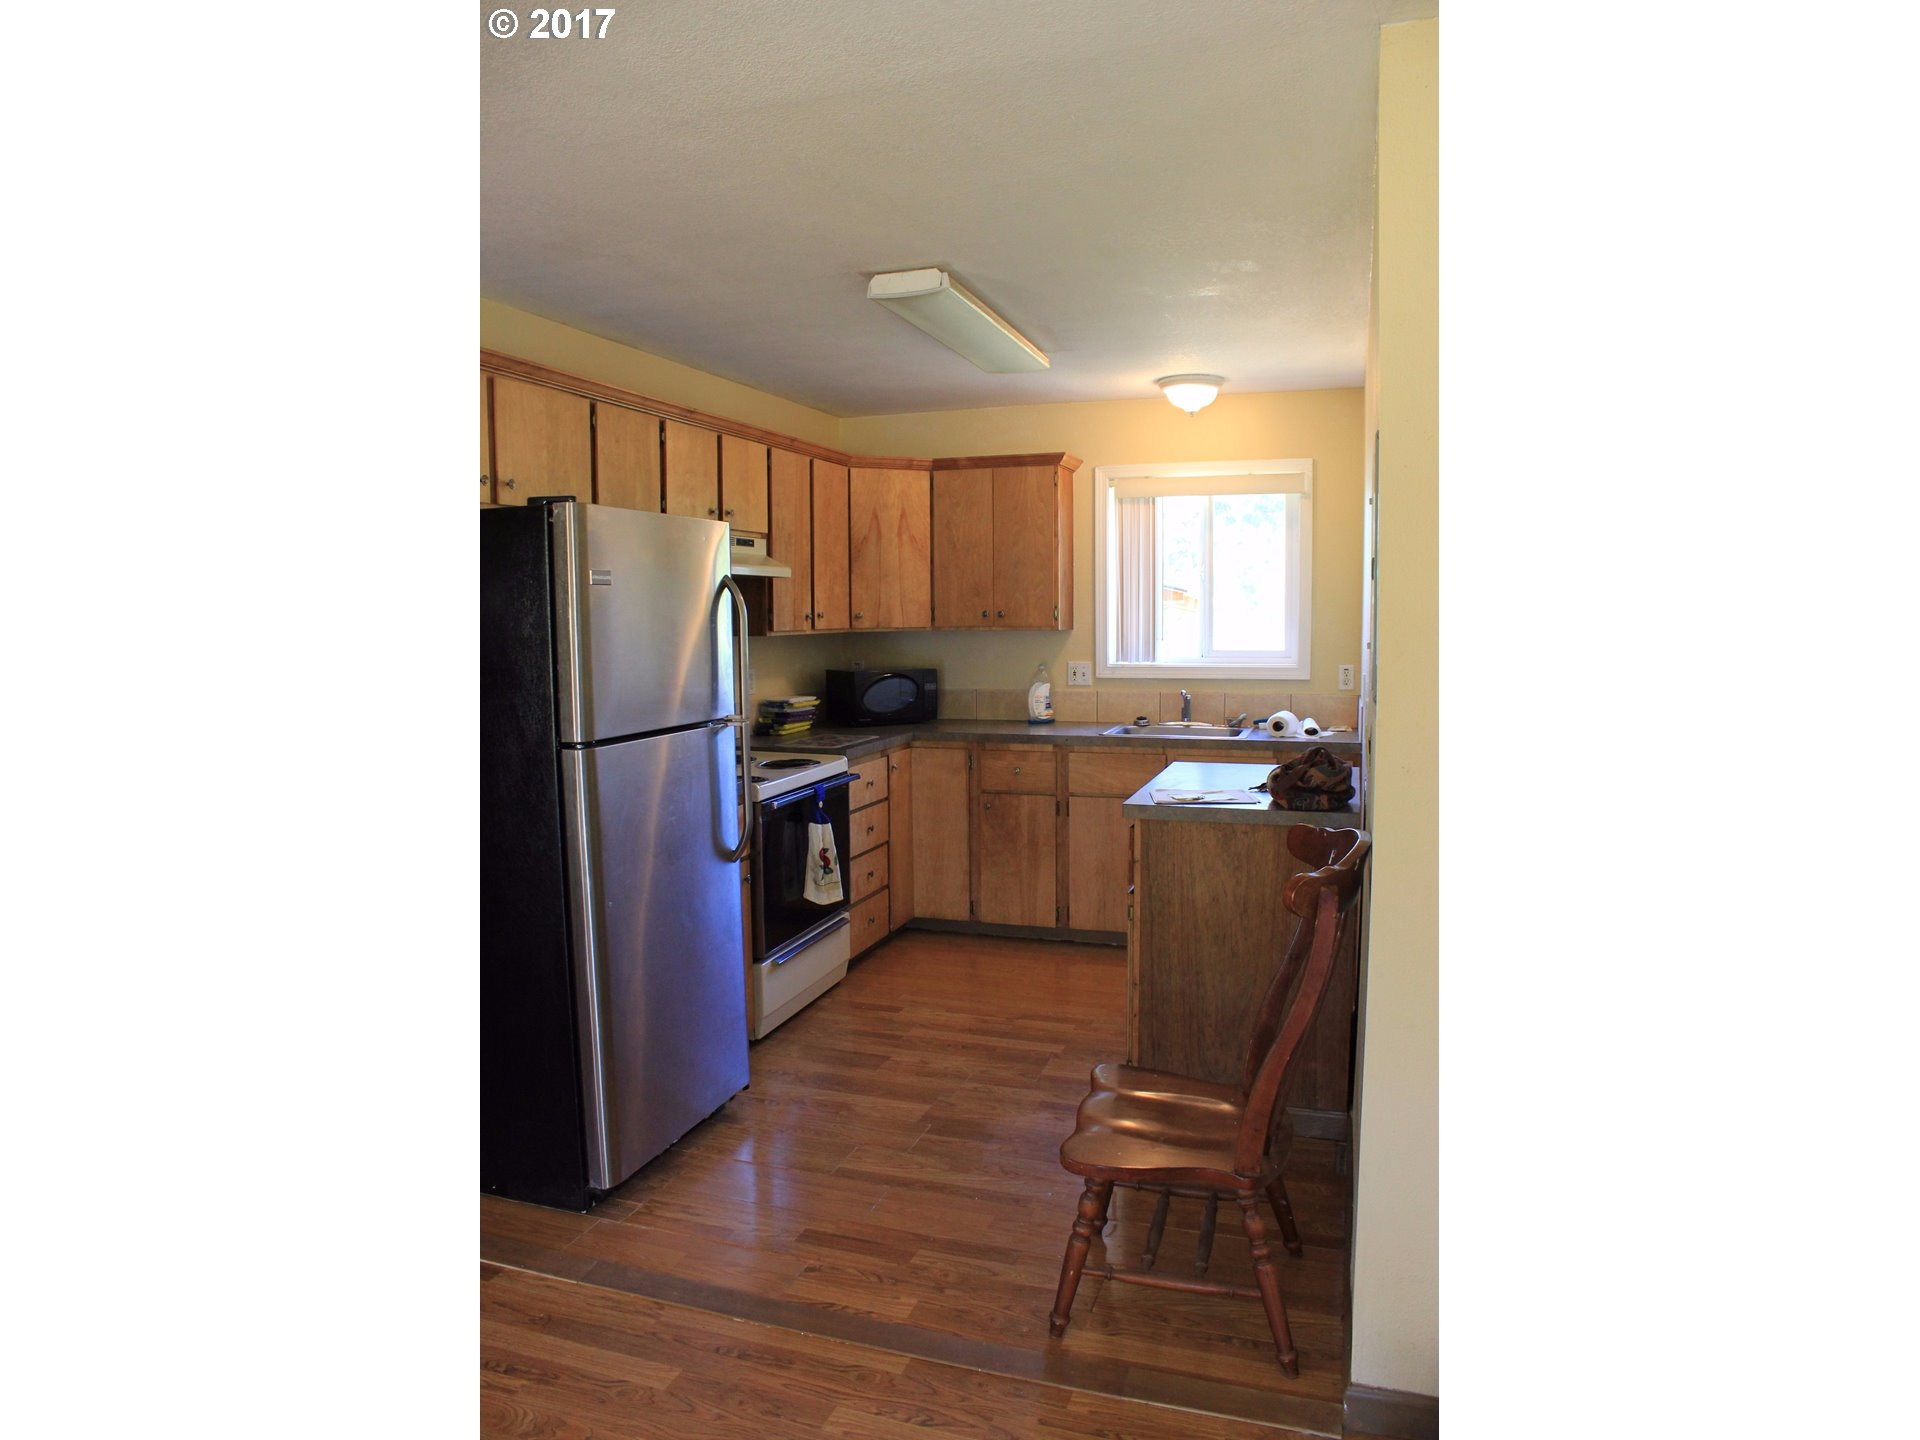 277 LOG CABIN RD Goldendale, WA 98620 - MLS #: 17651884